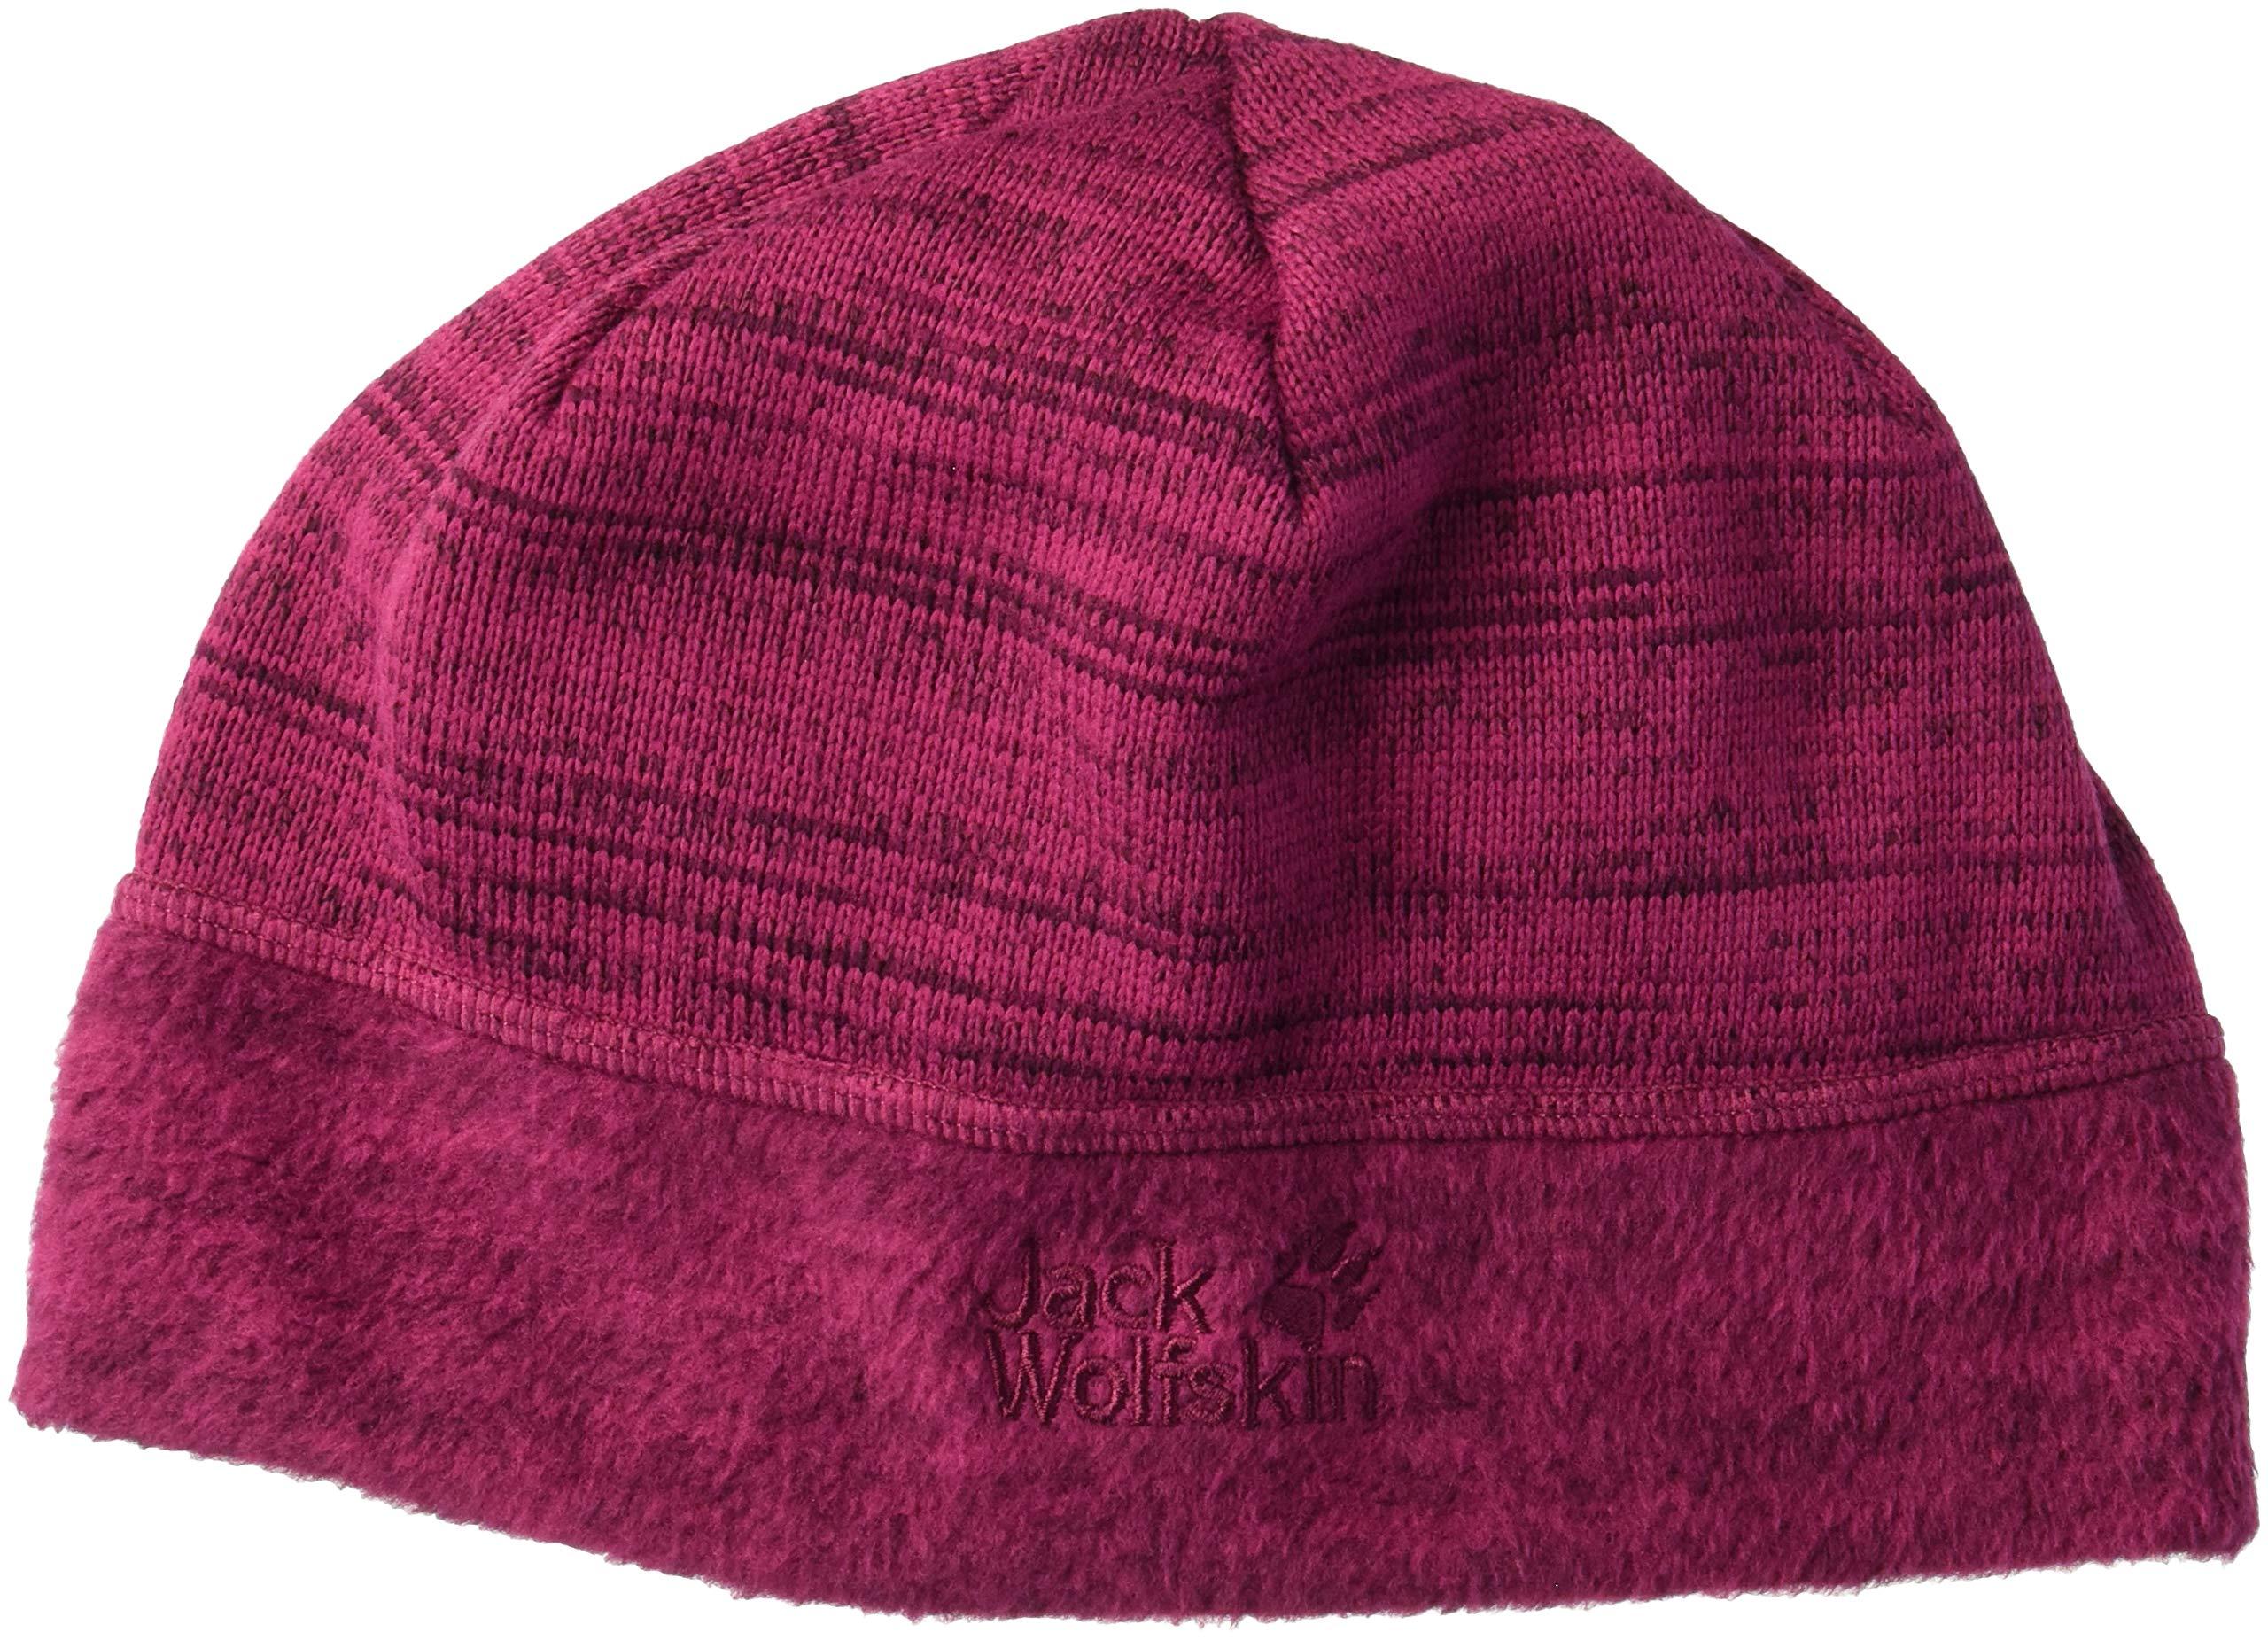 Jack Wolfskin Aquila Fleece Beanie Hat, Amethyst, Medium